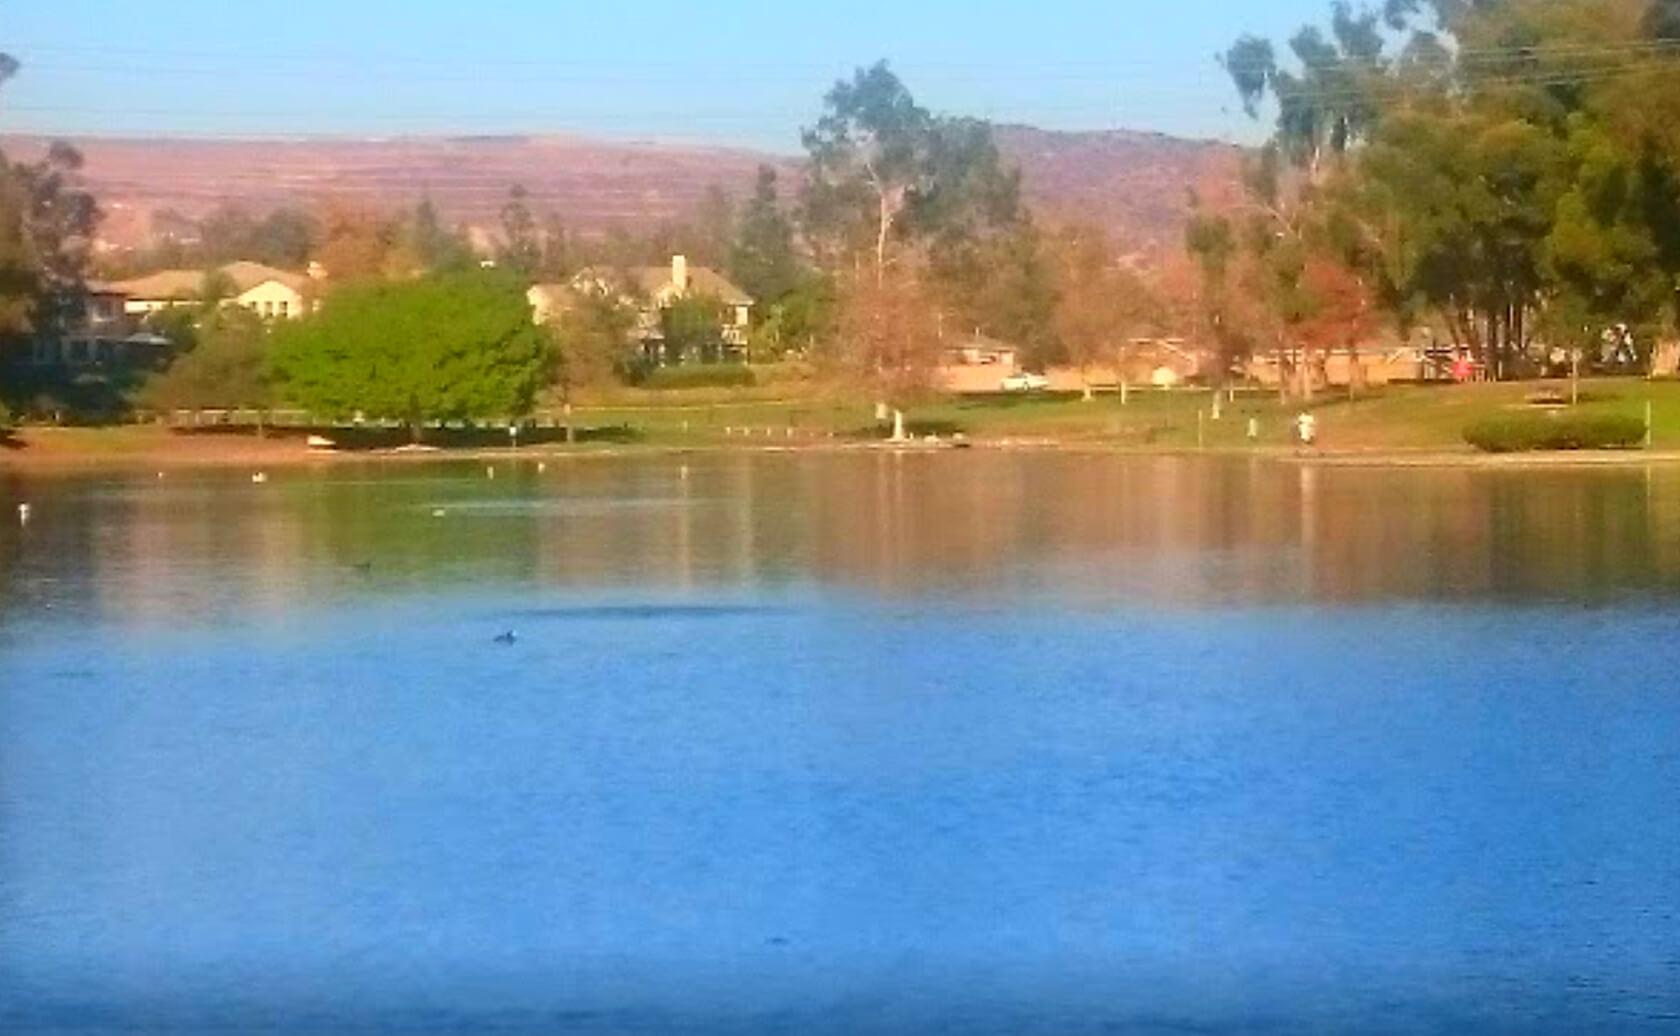 Tri-City-Park-Lake-Fishing-Guide-Report-Placentia-CA-04